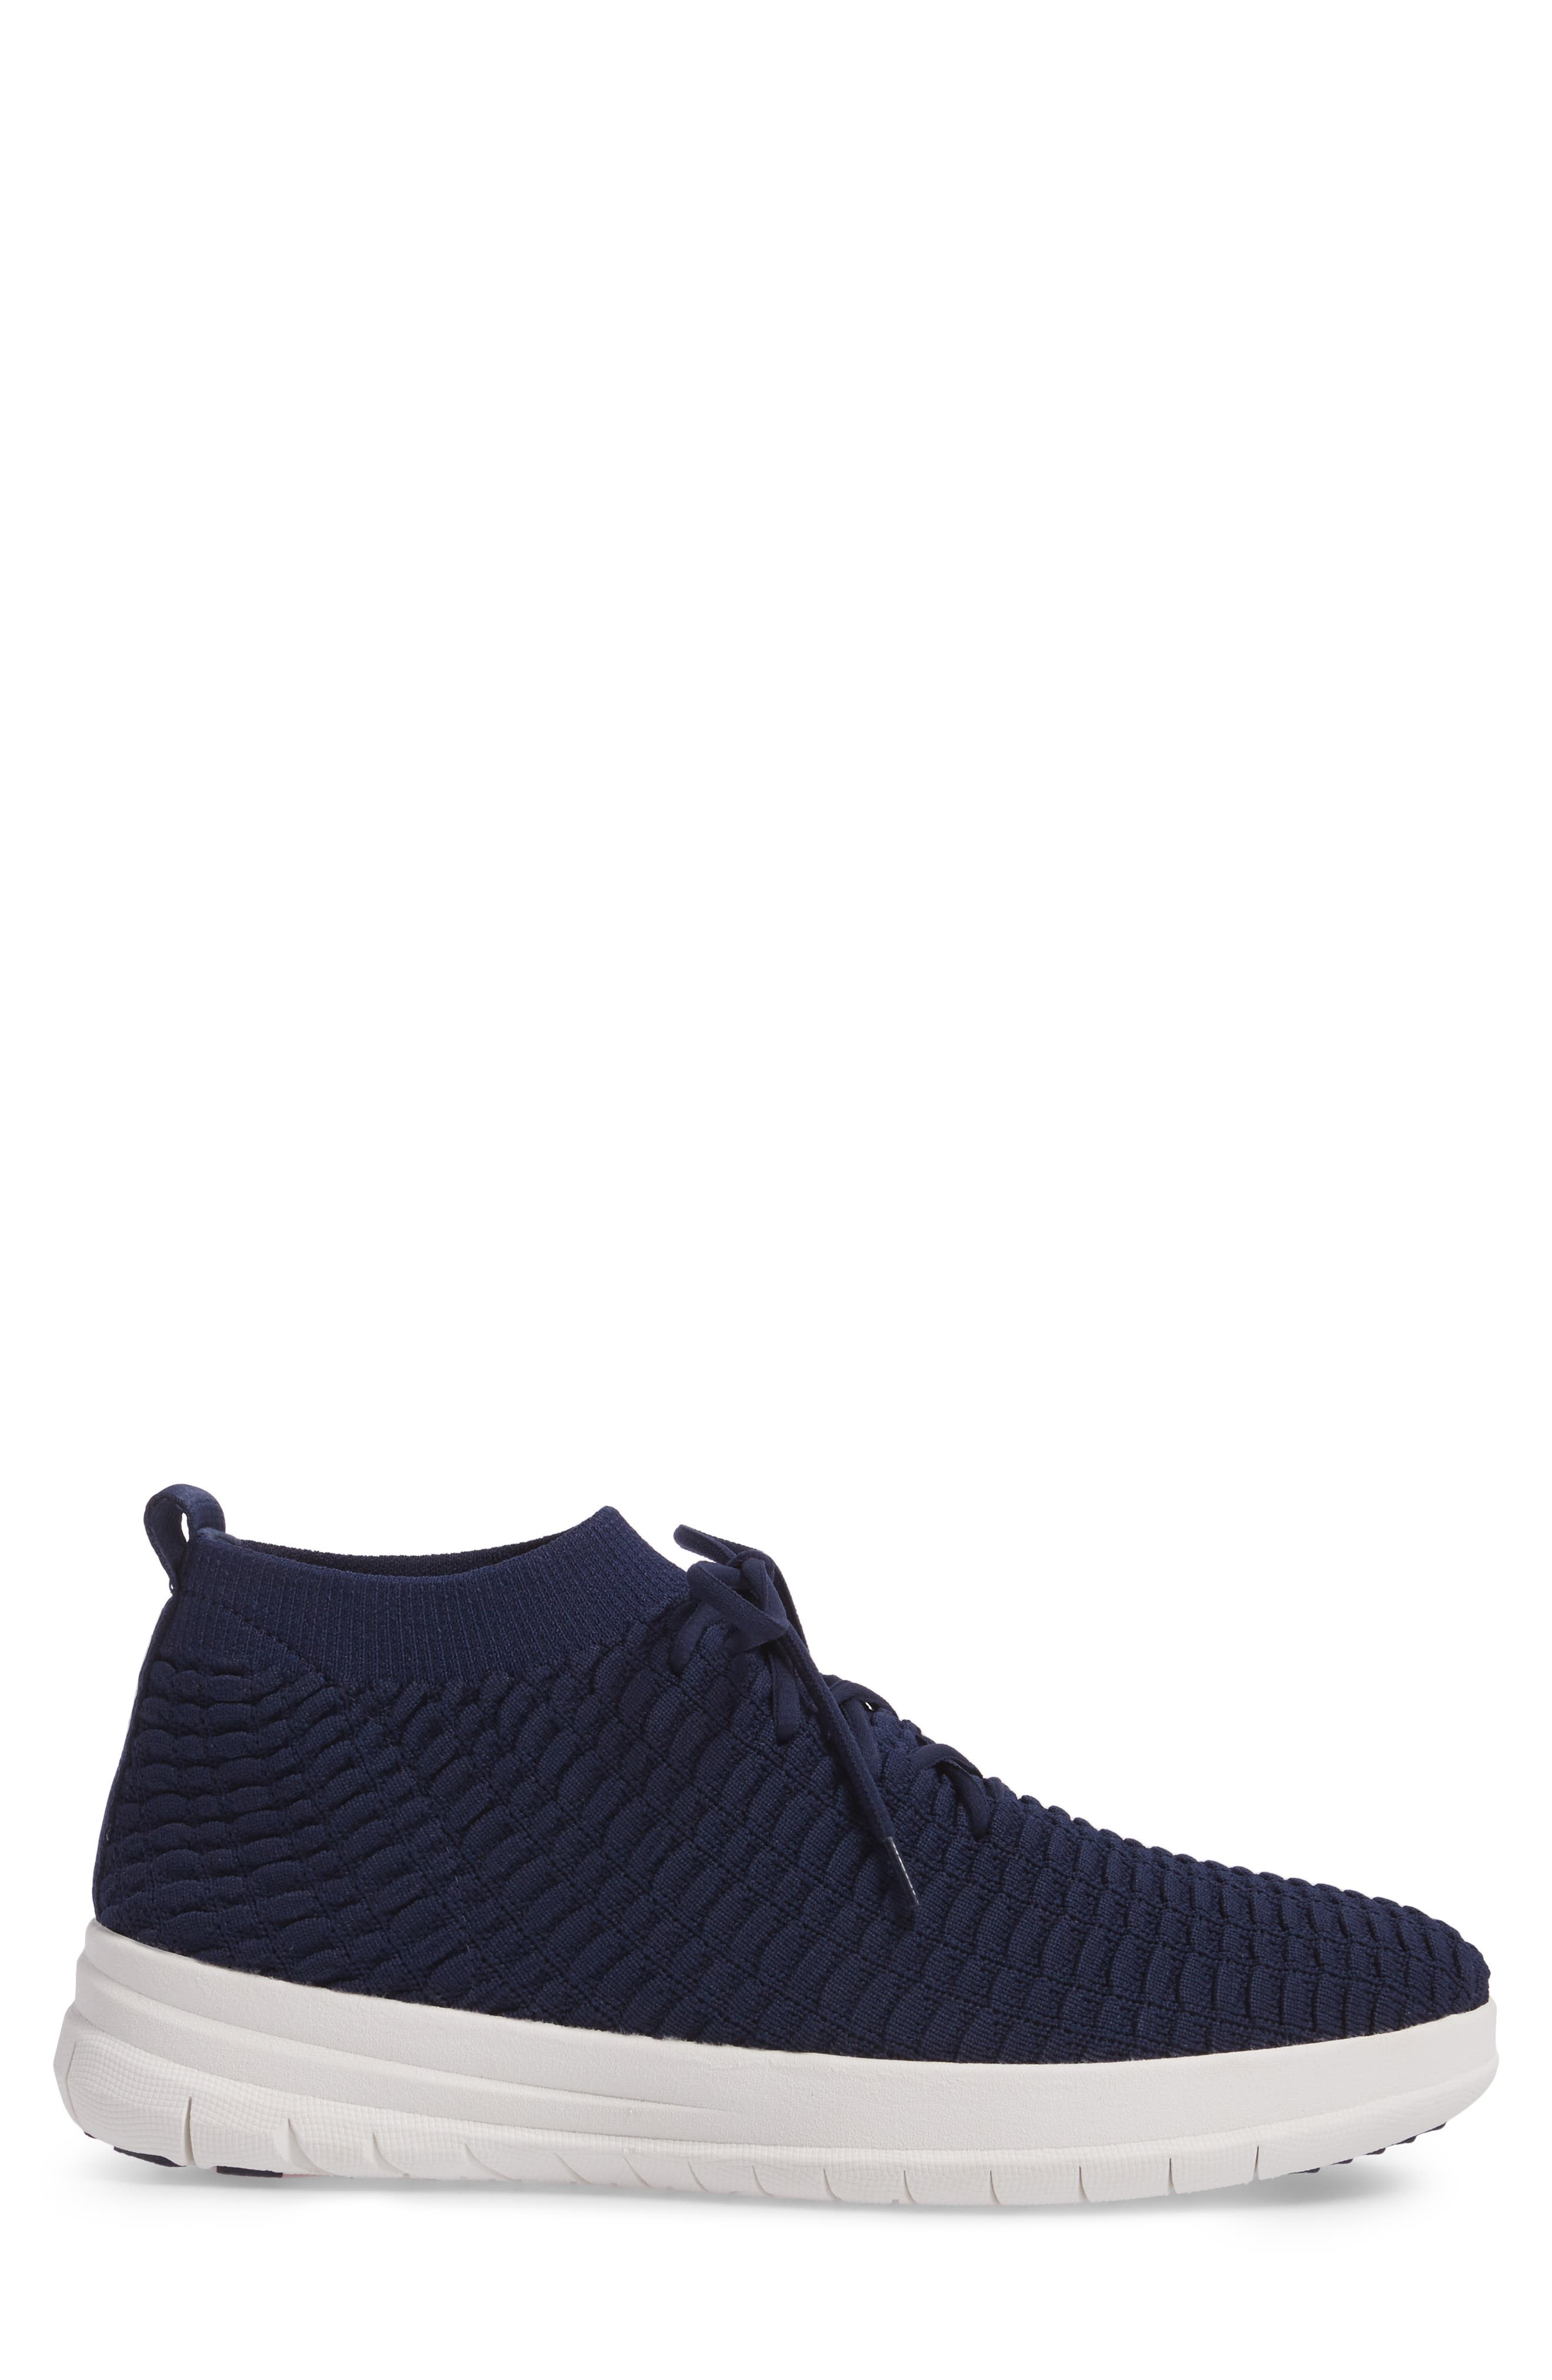 Uberknit Sneaker,                             Alternate thumbnail 3, color,                             DARK SAPPHIRE TEXTILE